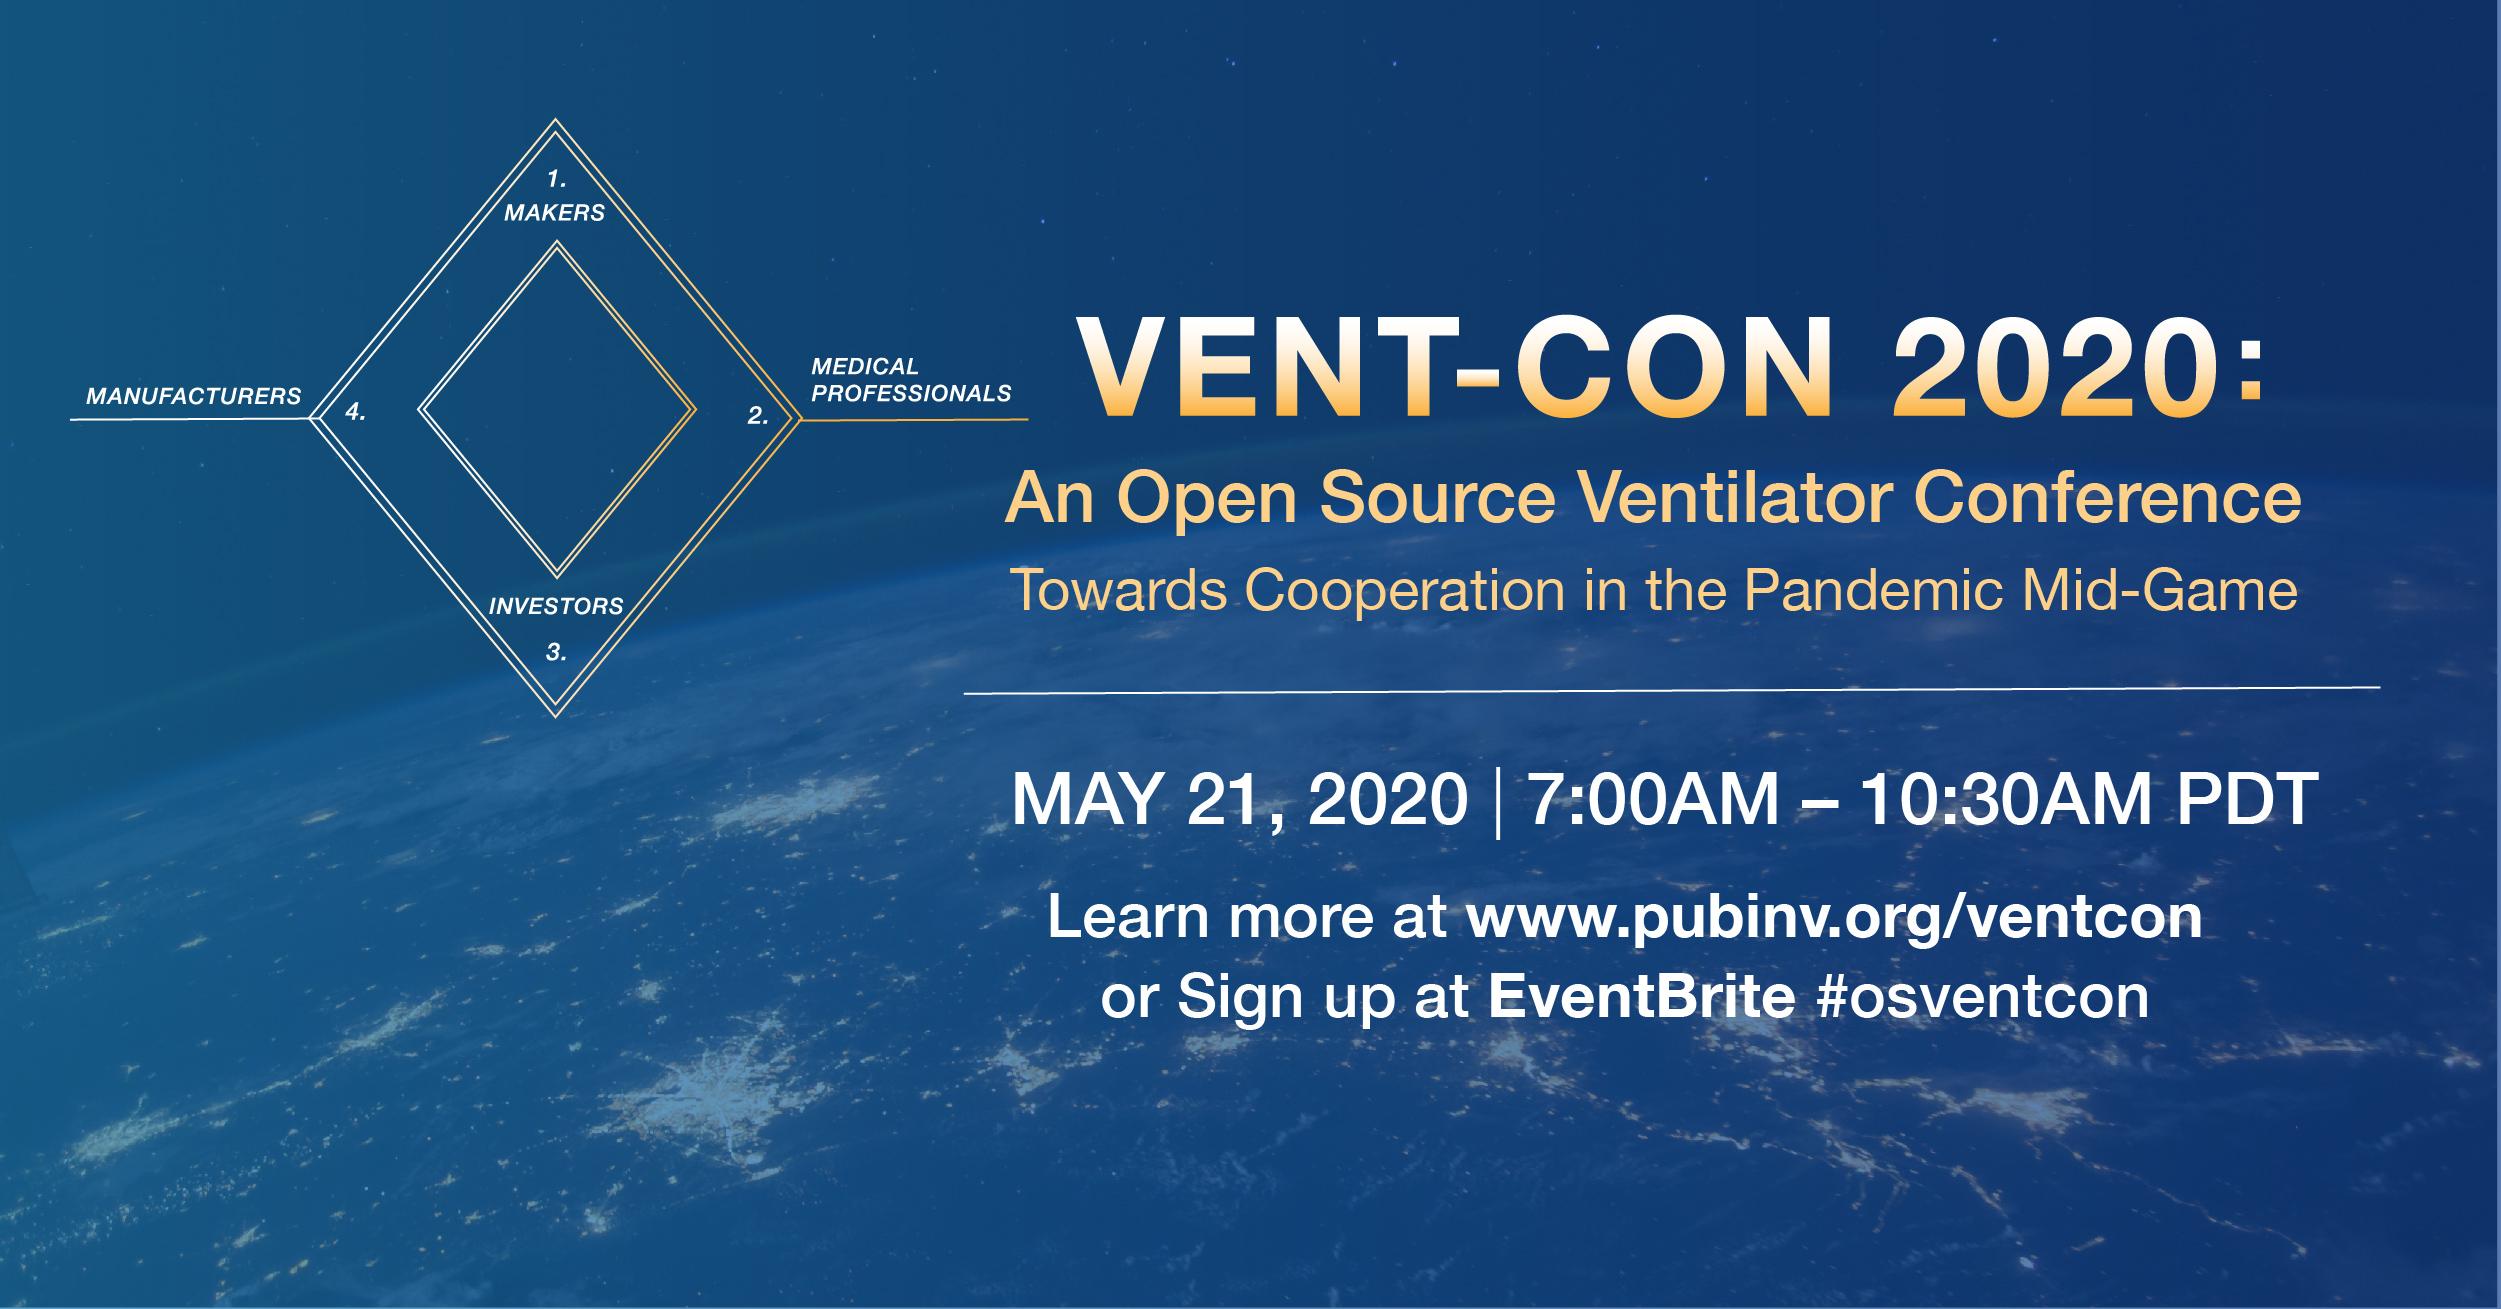 Vent-Con 2020 To Discuss the State of Open Source Ventilators